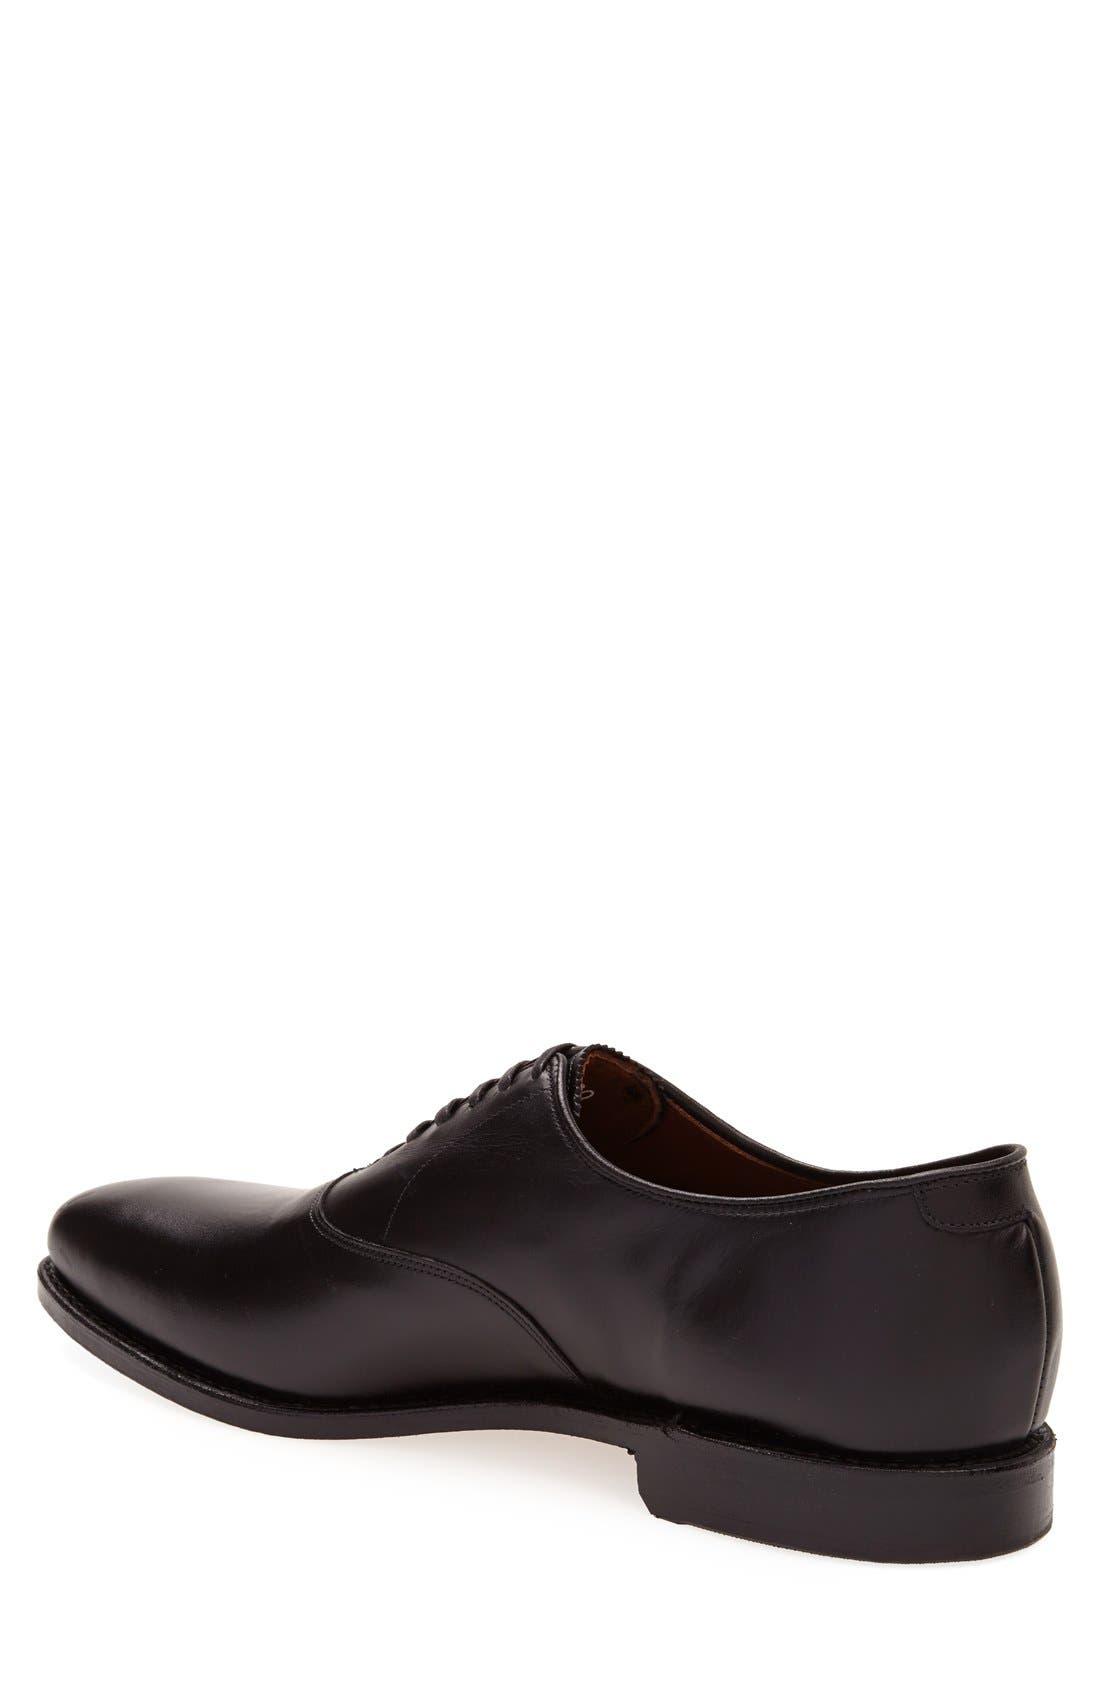 Alternate Image 2  - Allen Edmonds Carlyle Plain Toe Oxford (Men)